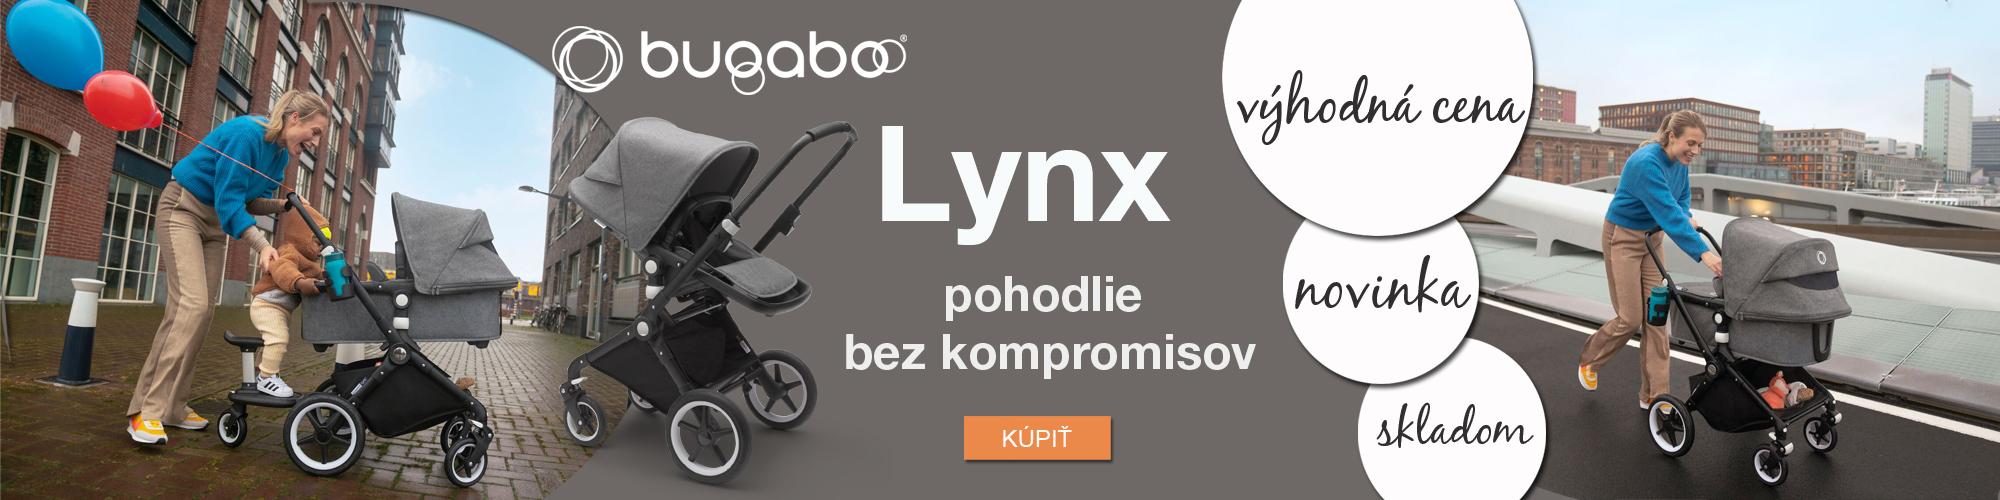 Bugaboo Lynx